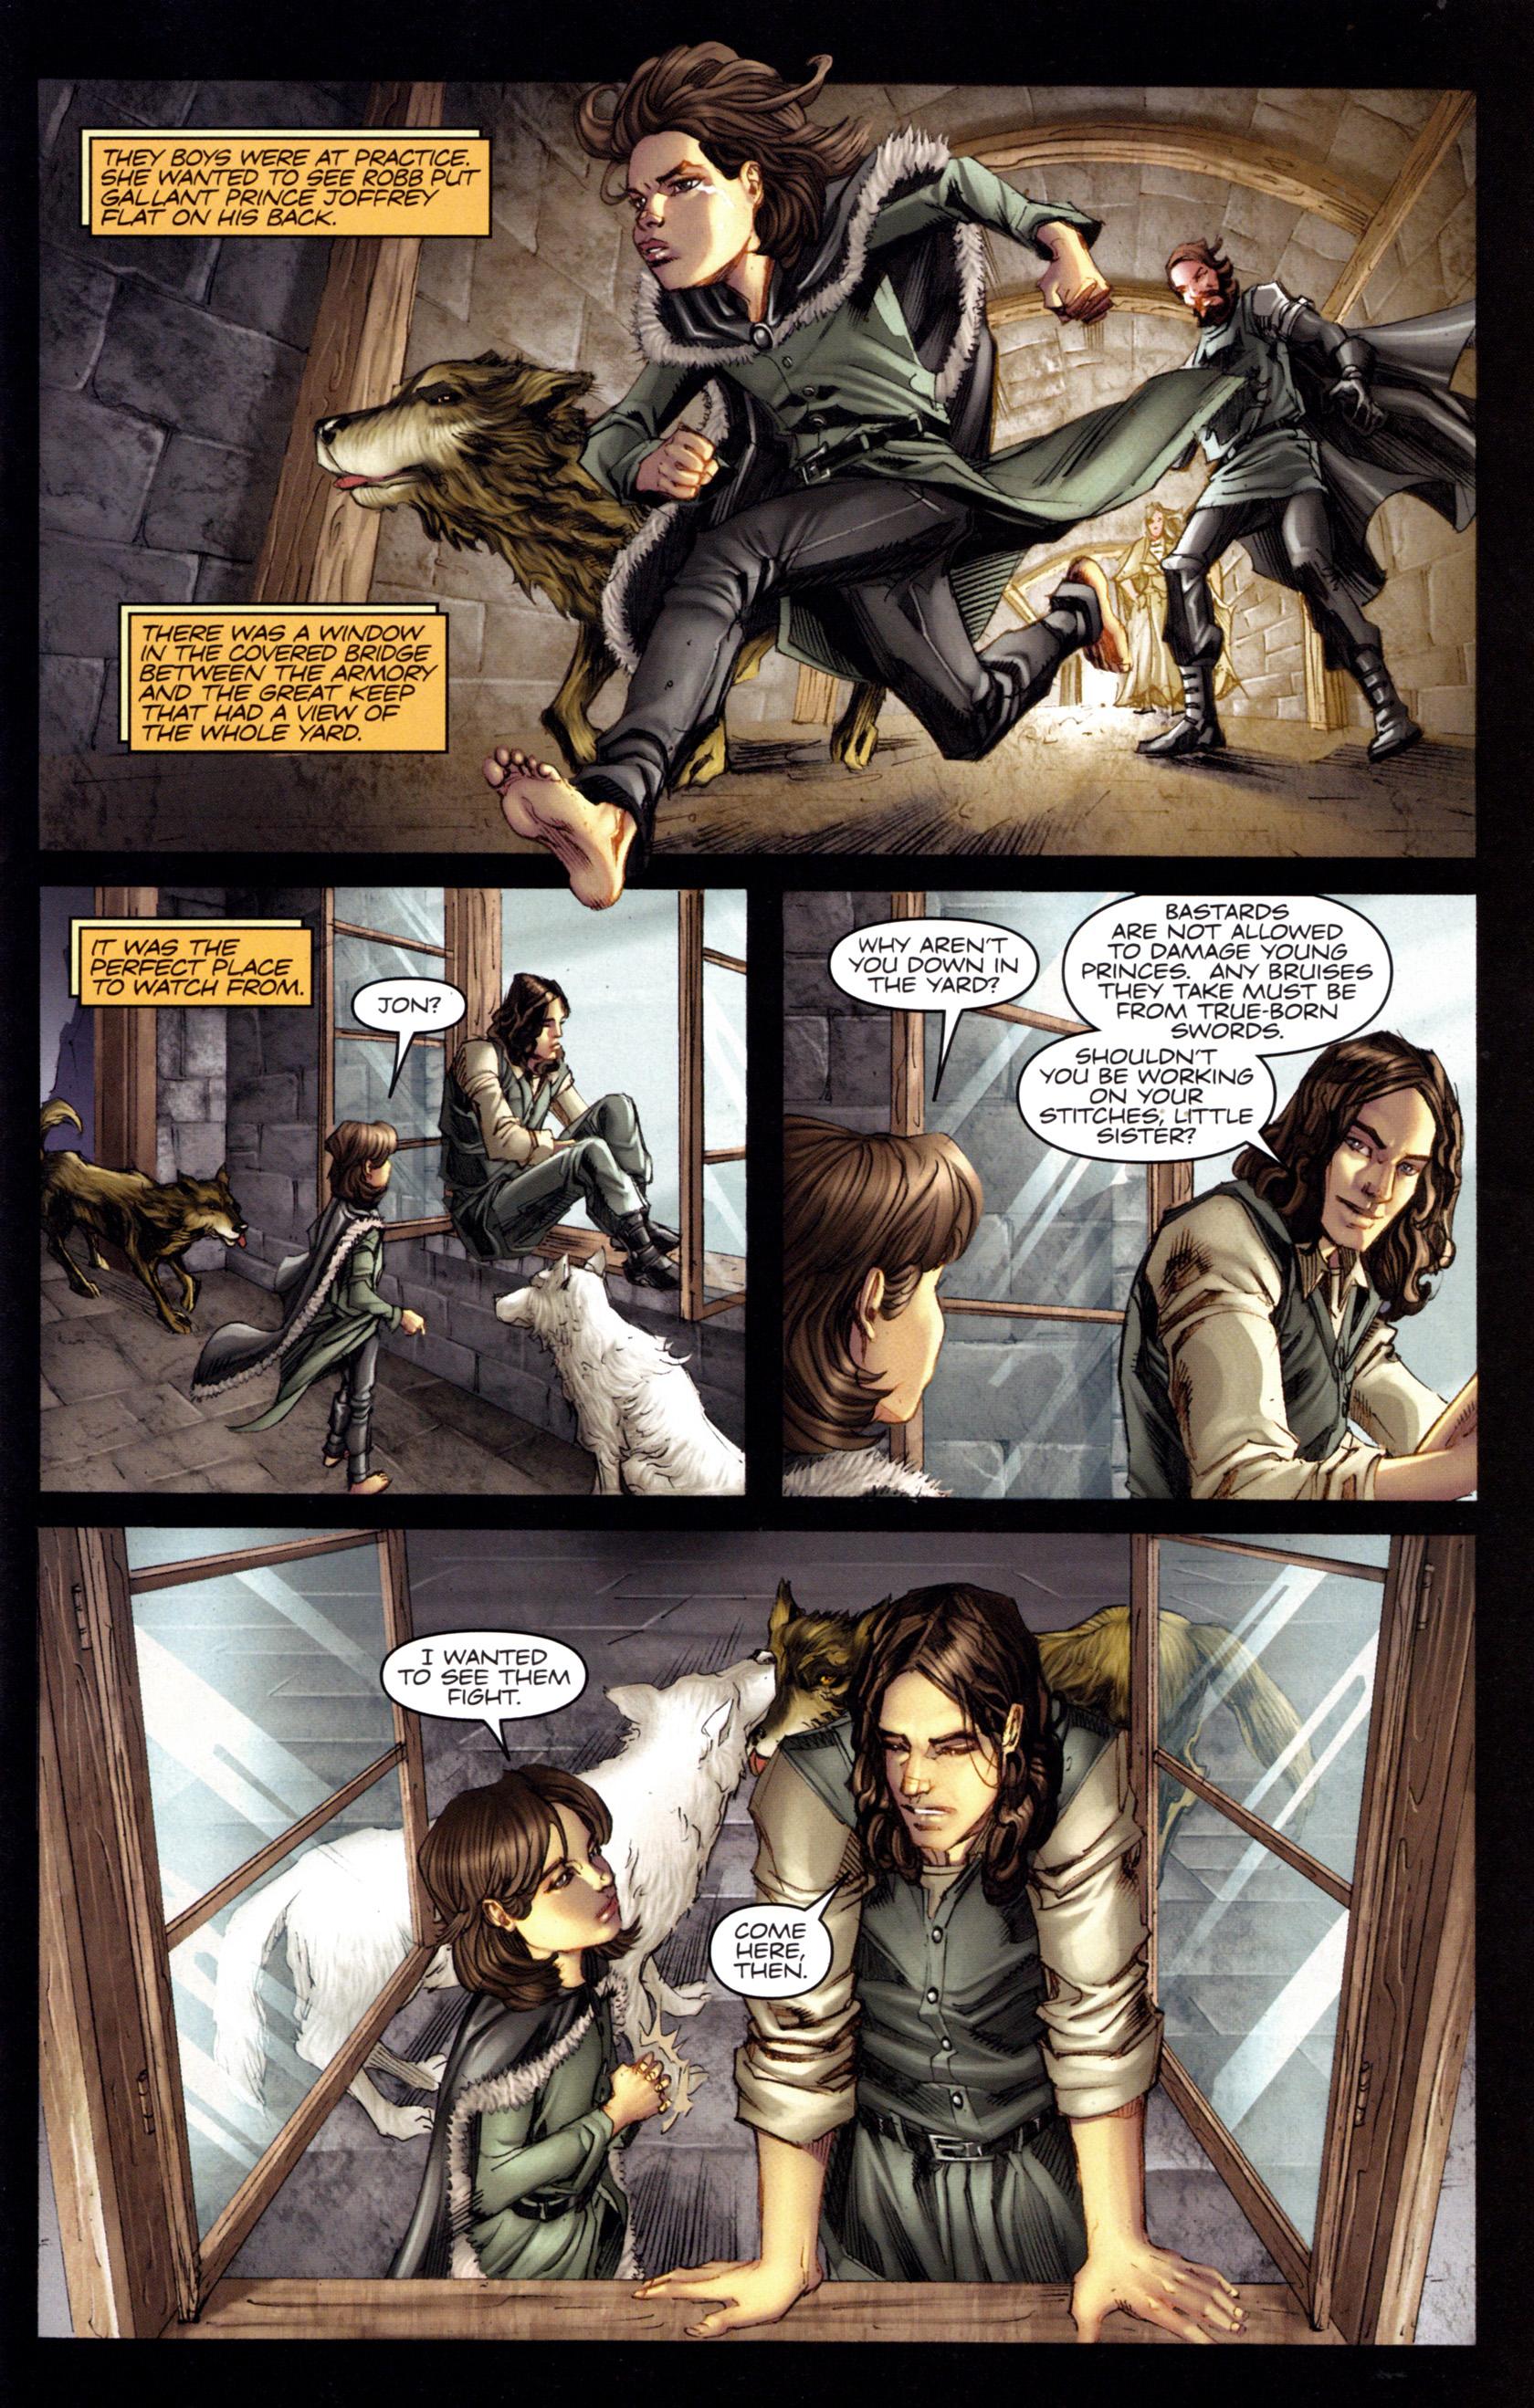 Jon Snow se muestra muy cercano a su hermana, Arya